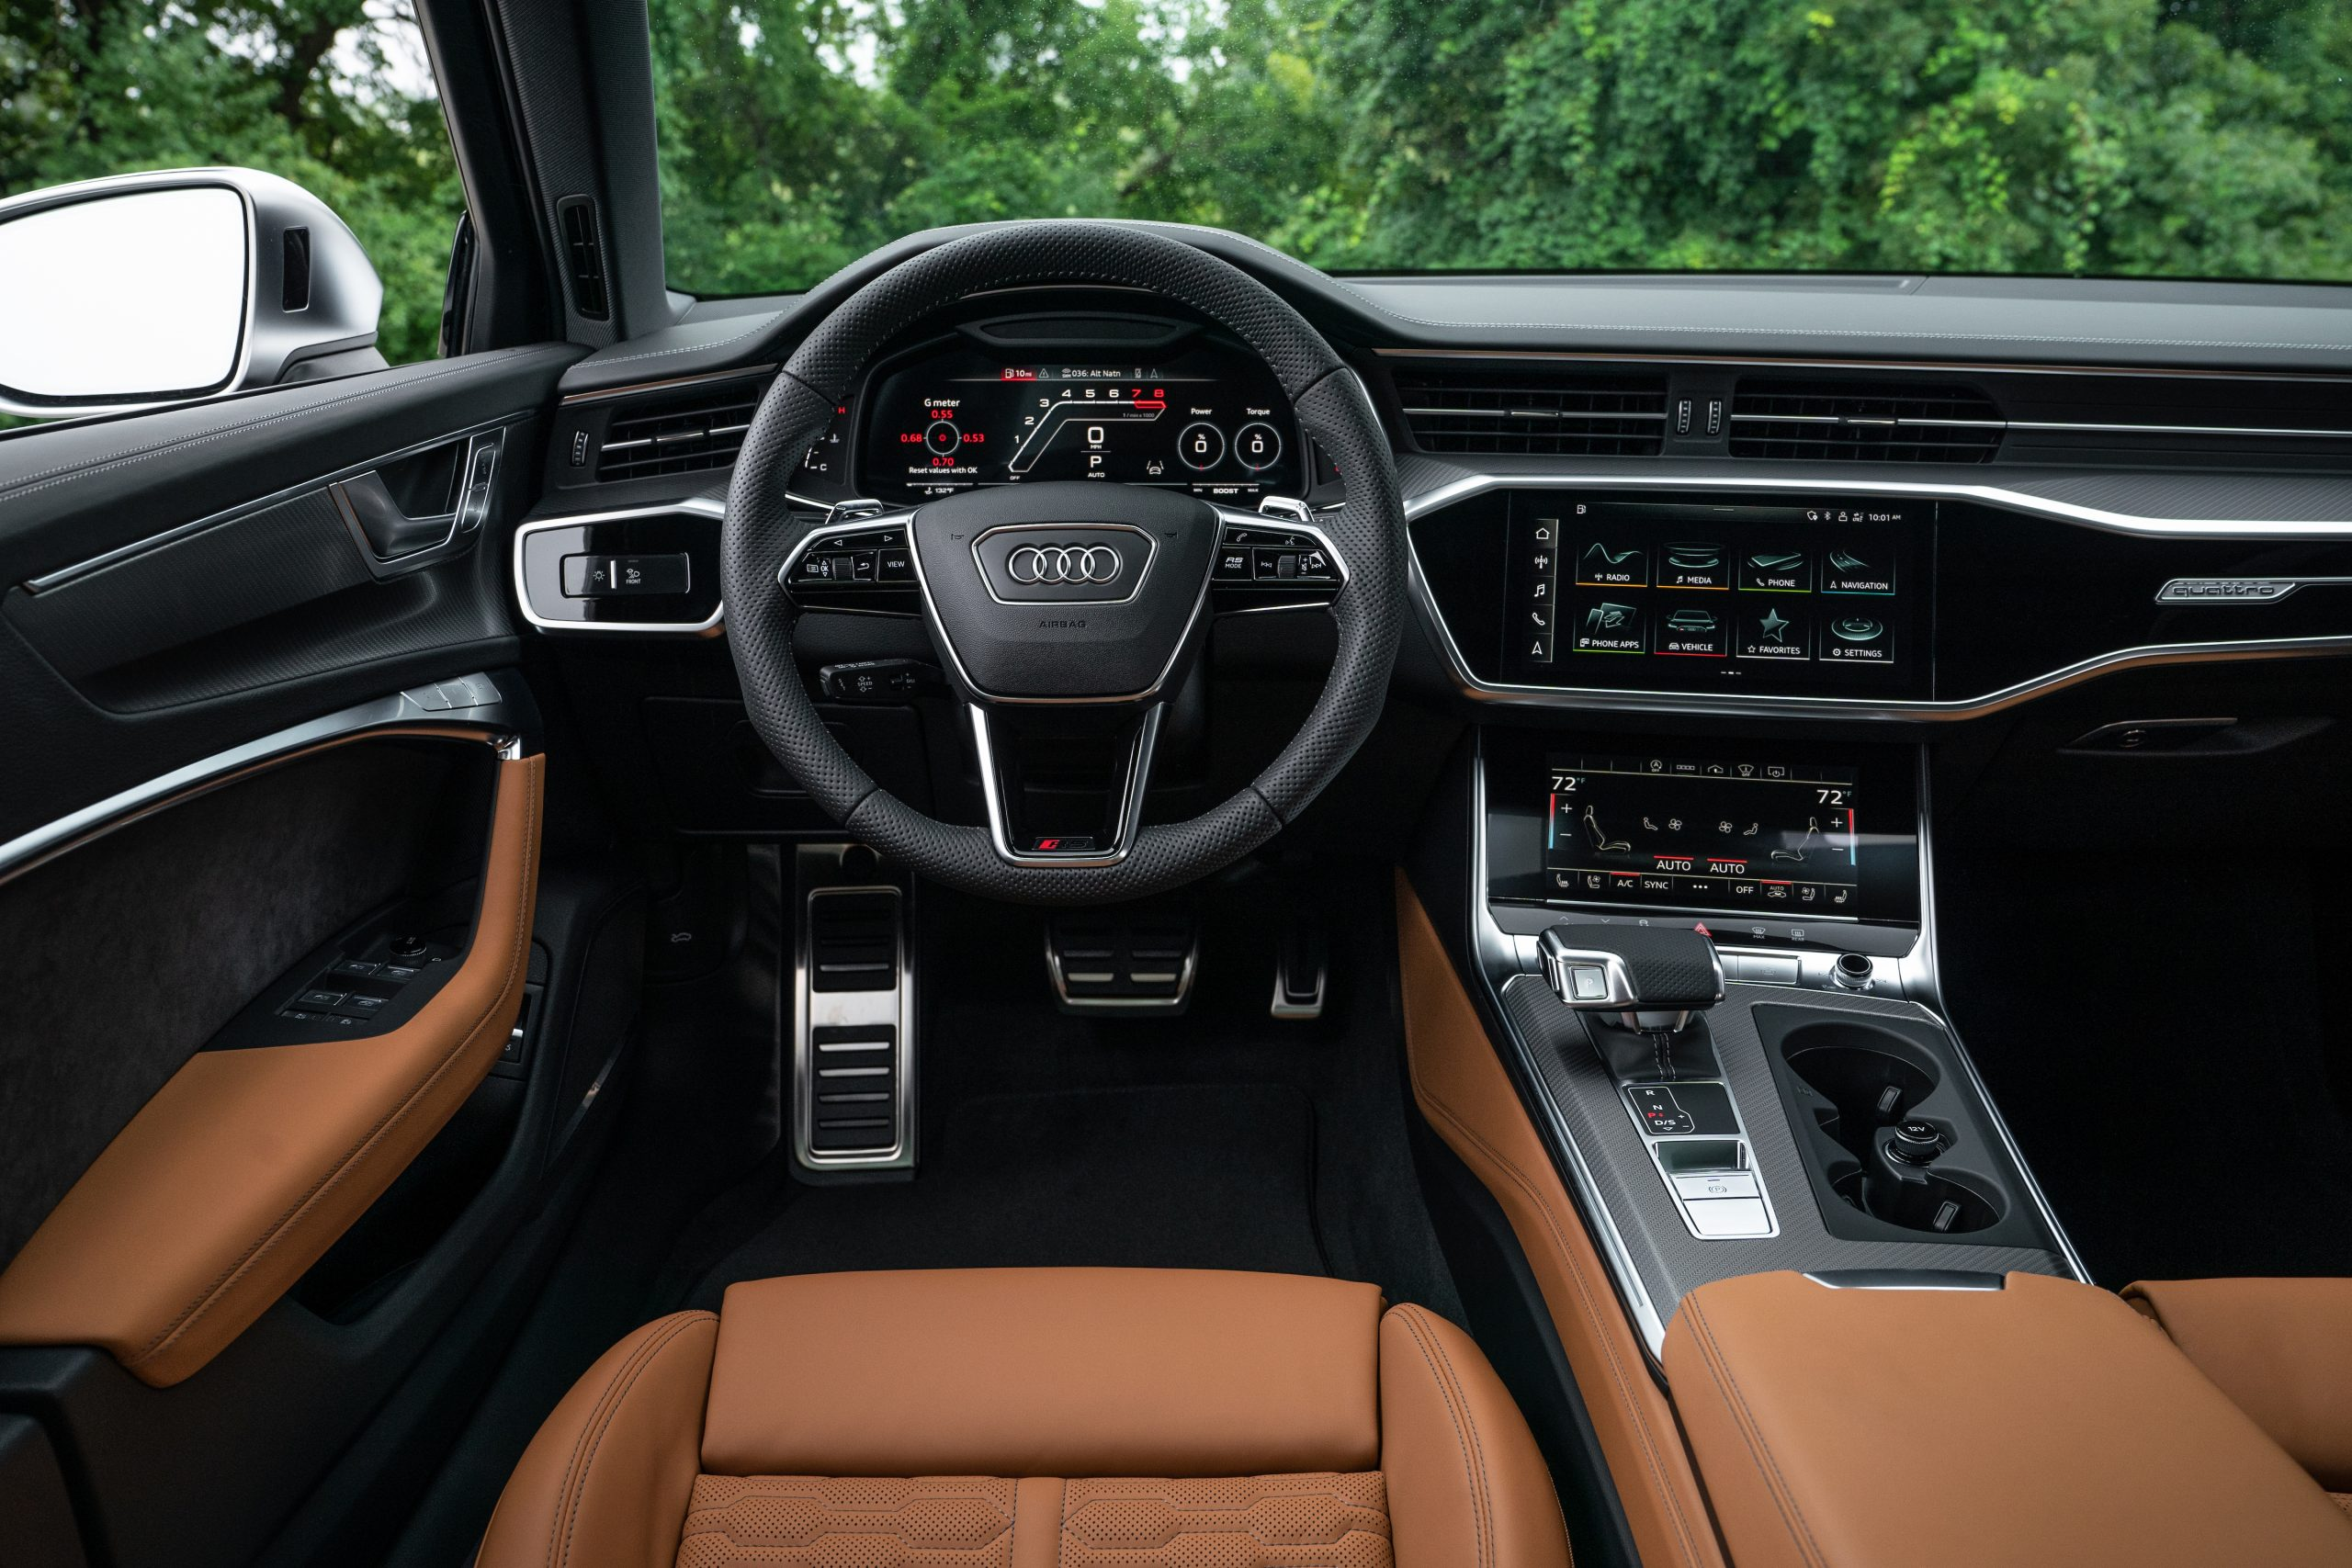 RS 6 Avant Nardo Gray interior drivers seat cockpit